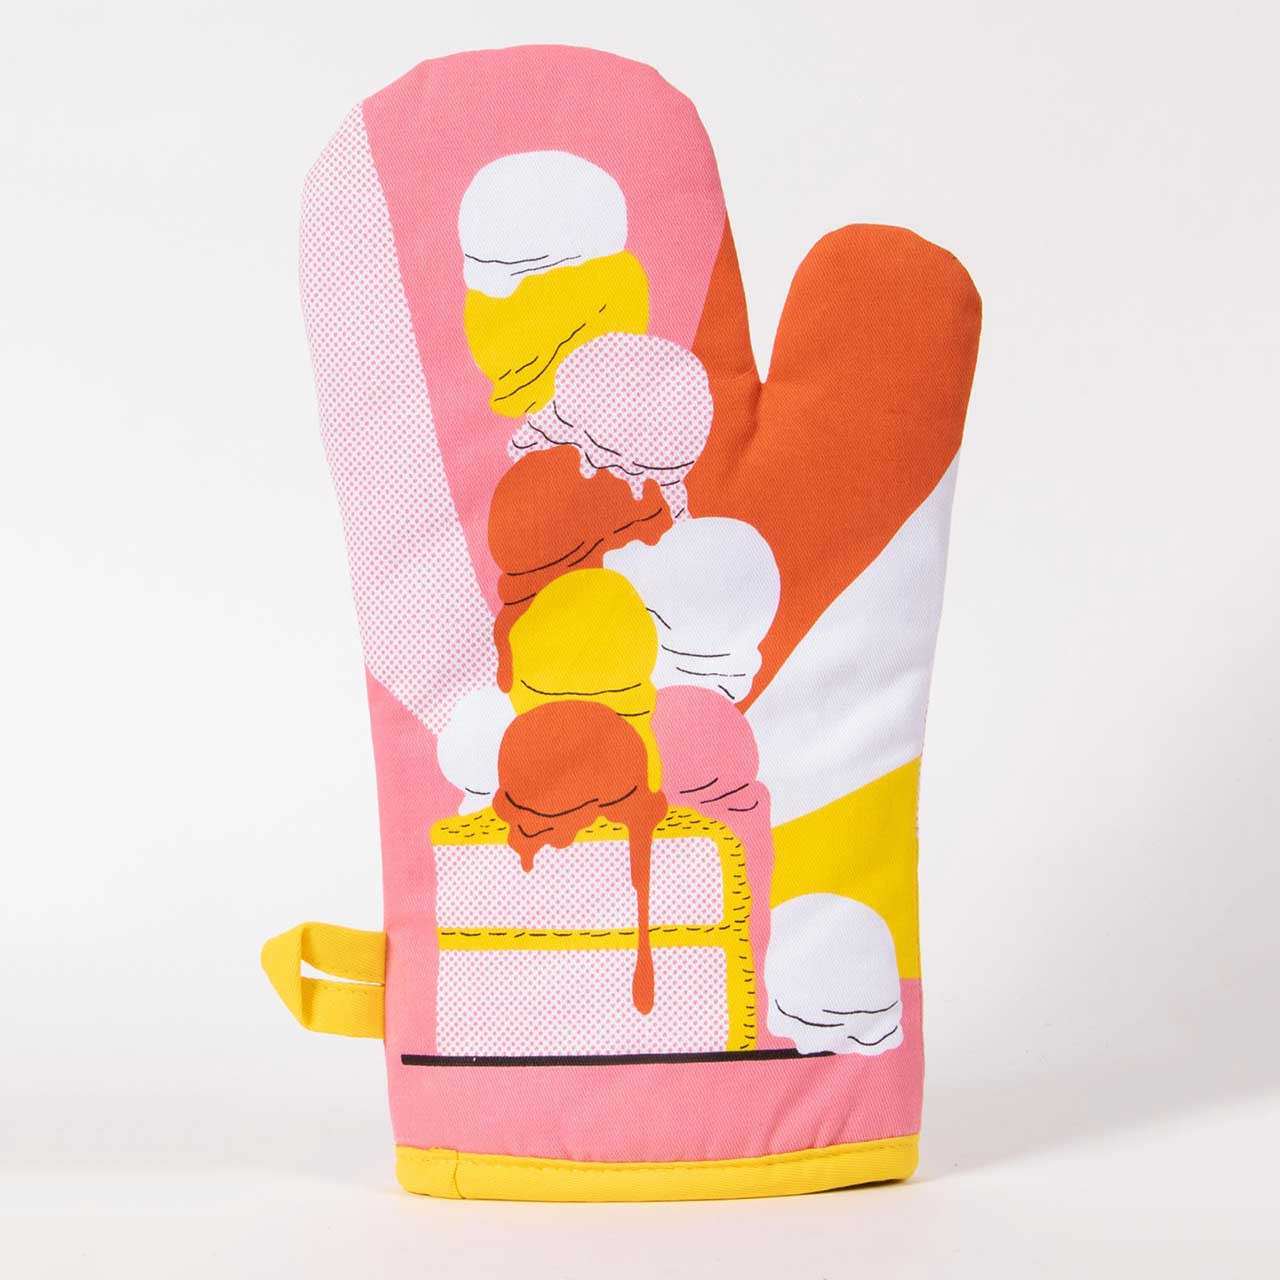 I'm gonna a la mode the f*ck out of this - One Oven Mitt by Blue Q | The Design Gift Shop